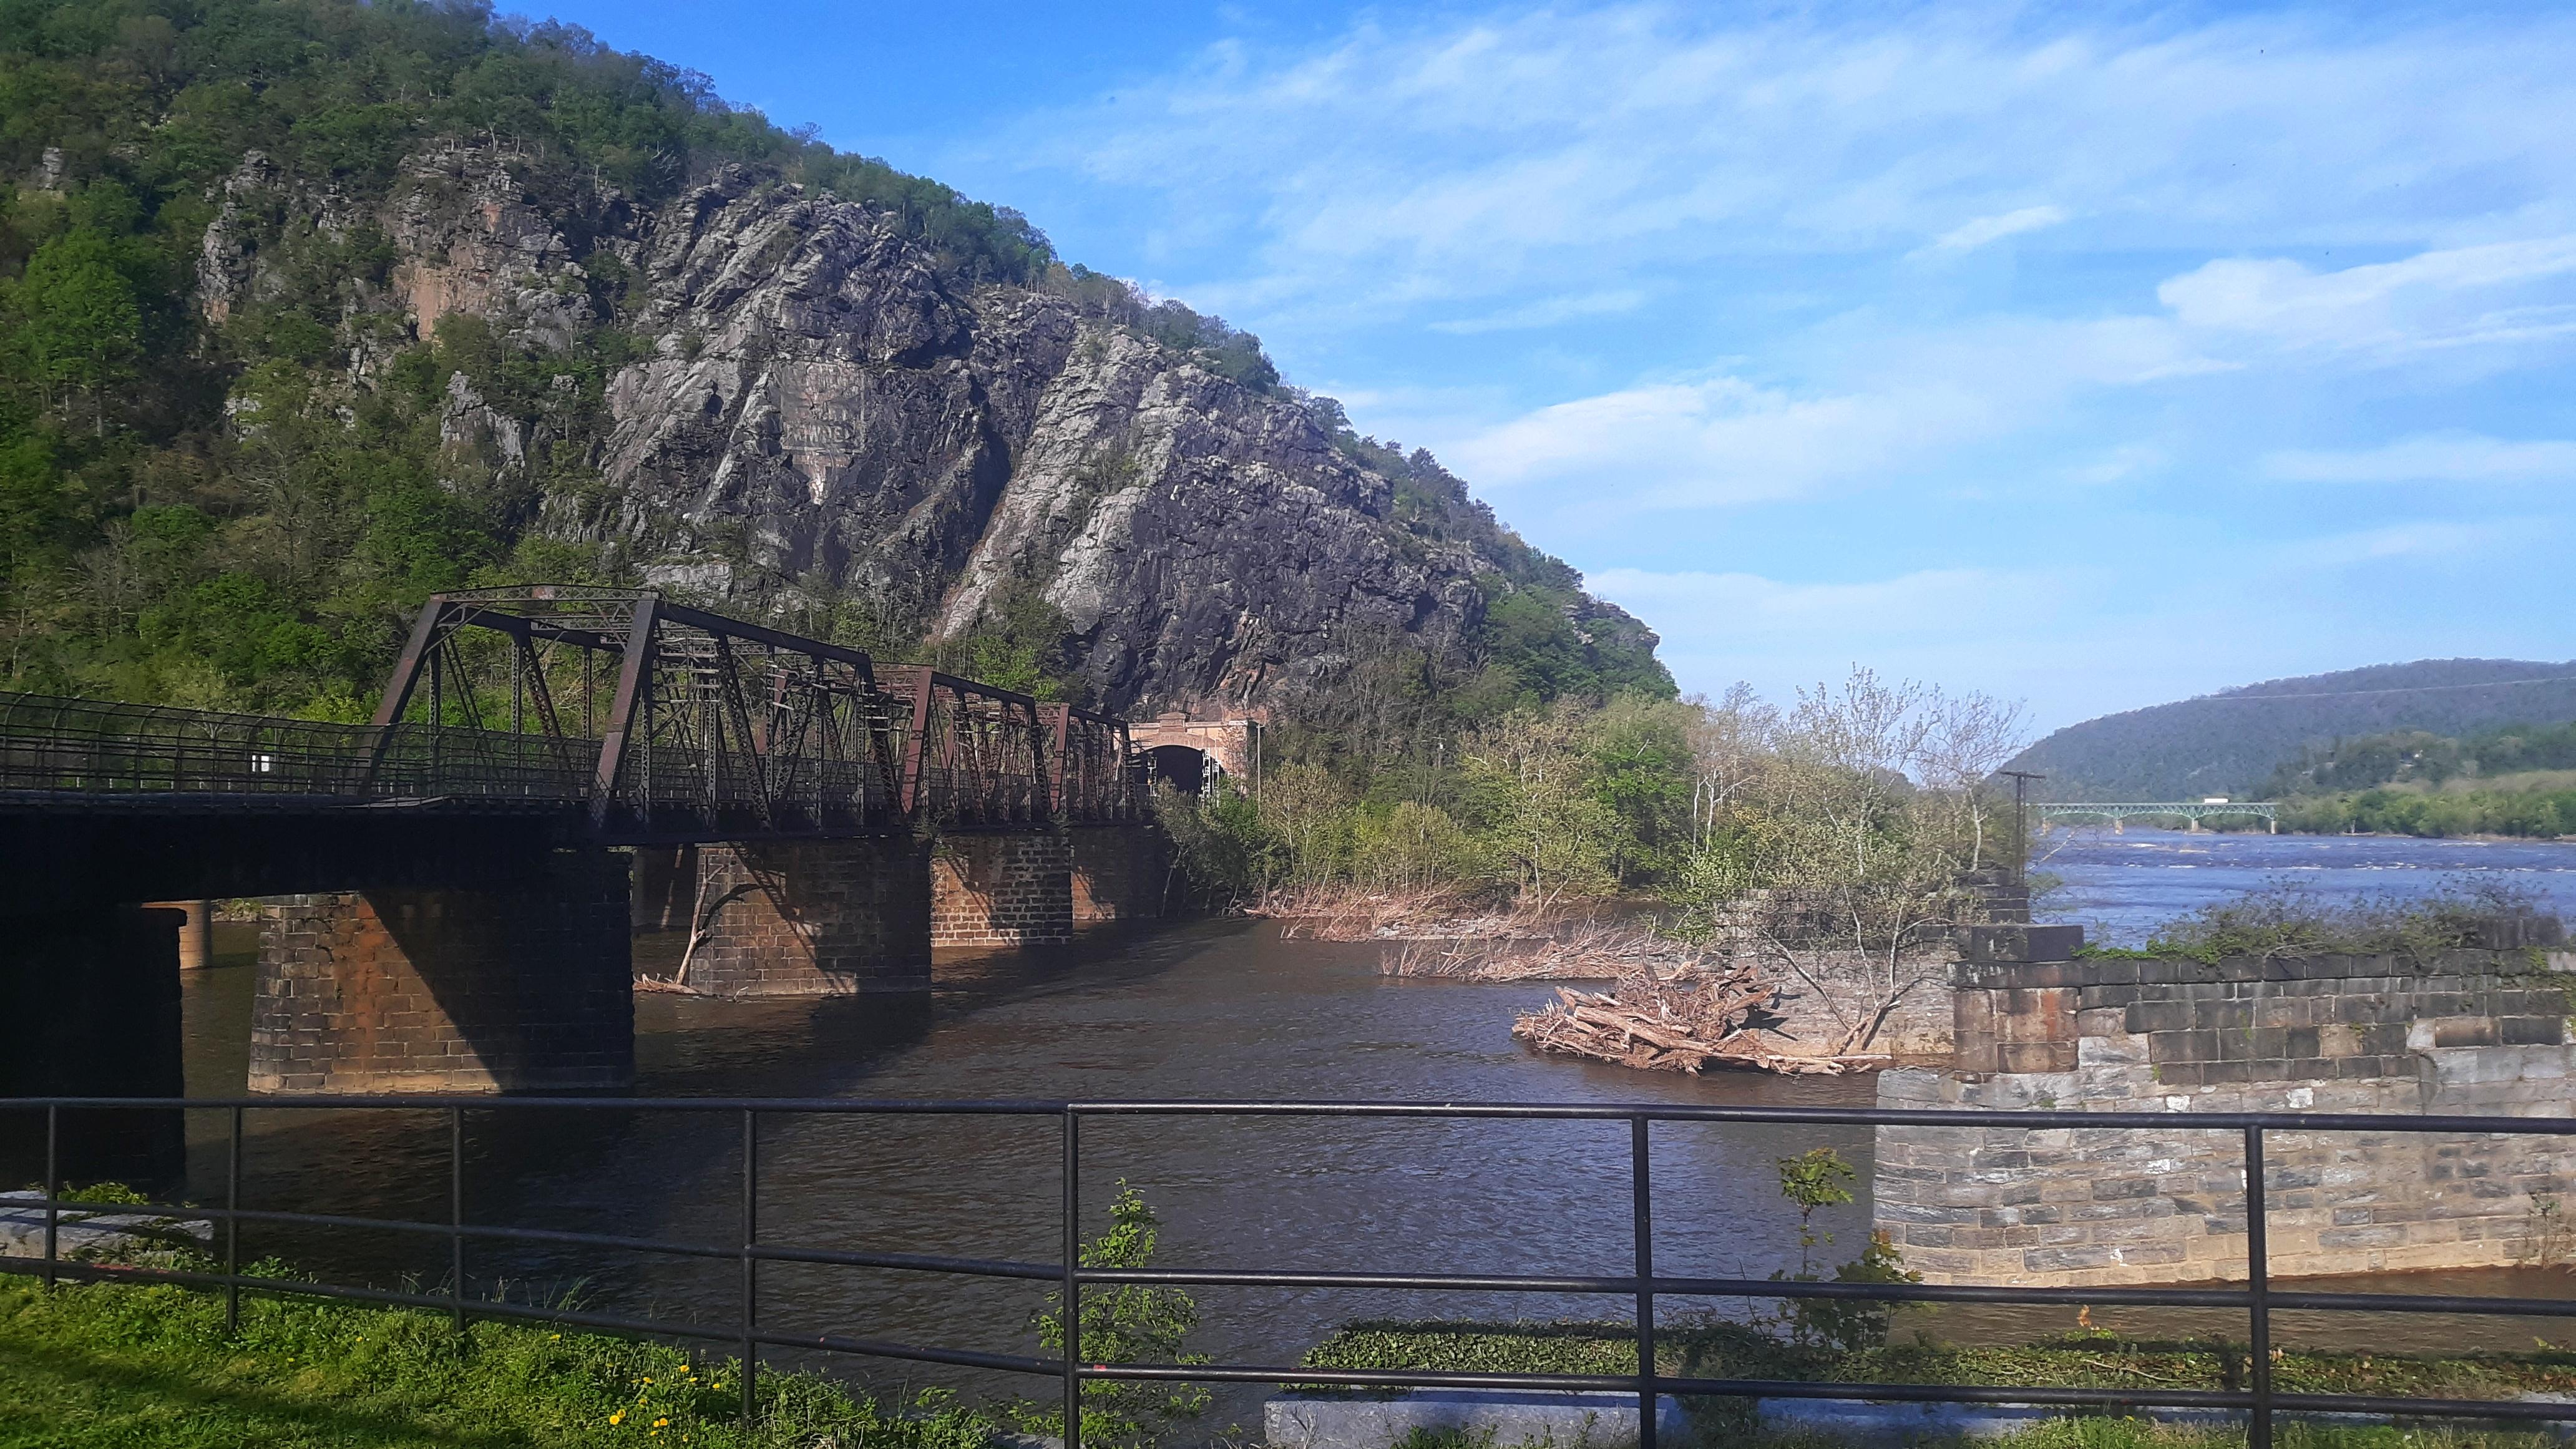 Appalachian Trail Footbridge in Harpers Ferry Closed after Train Derails - The Trek